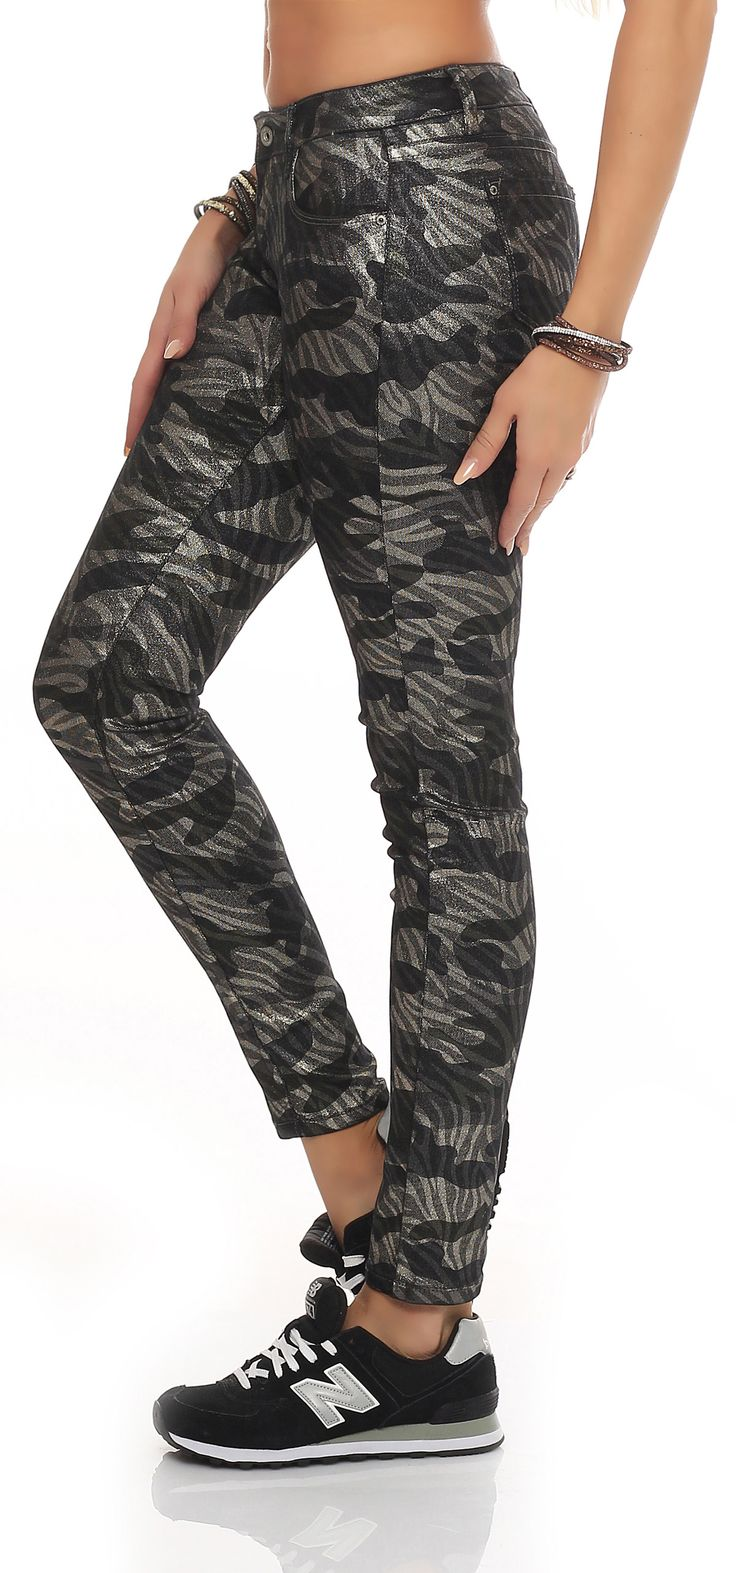 SKUTARI Damen - Jeans Skinny Stretch Glitzer Camouflage Effekt Röhrenjeans – Bild 2